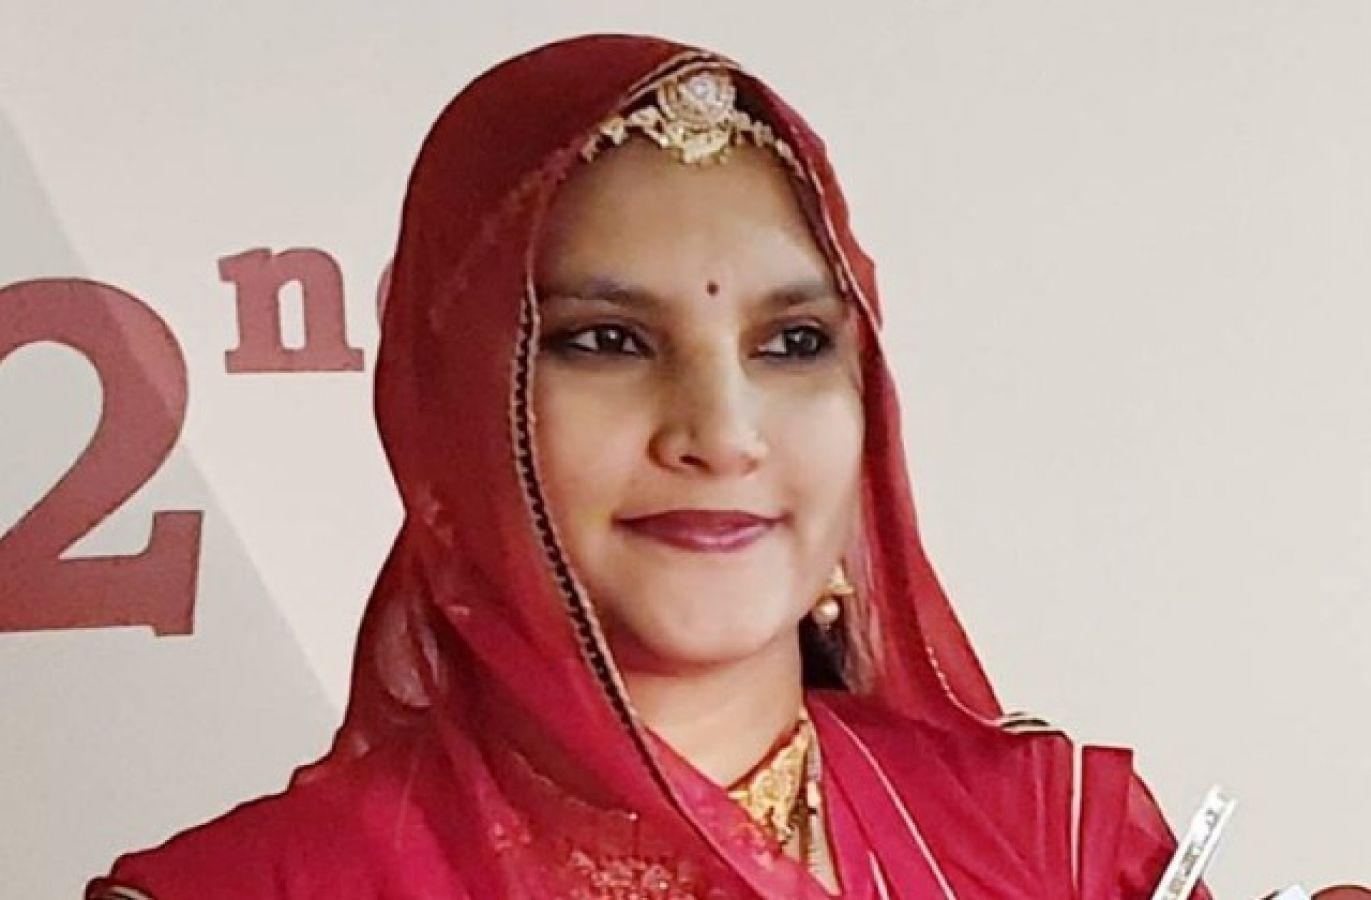 Ruma Devi: India's award-winning rural fashion designer who has made 22,000 women self-dependent